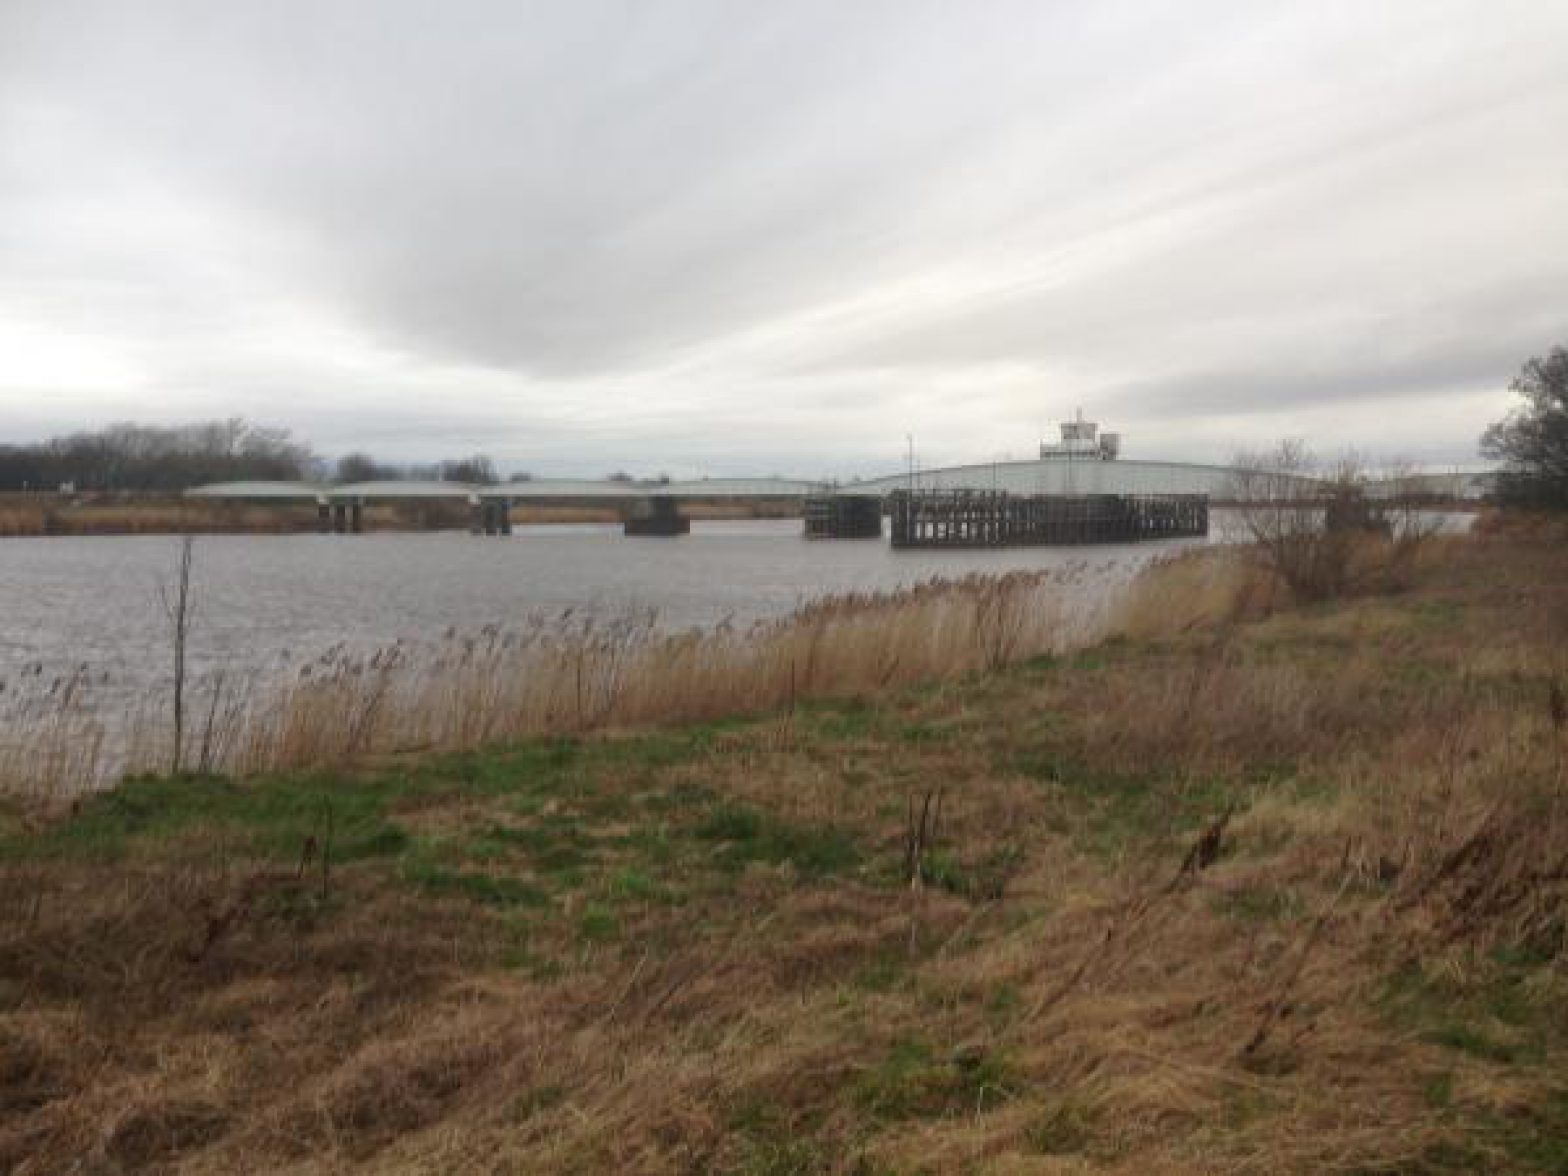 Railway bridge-other side of river